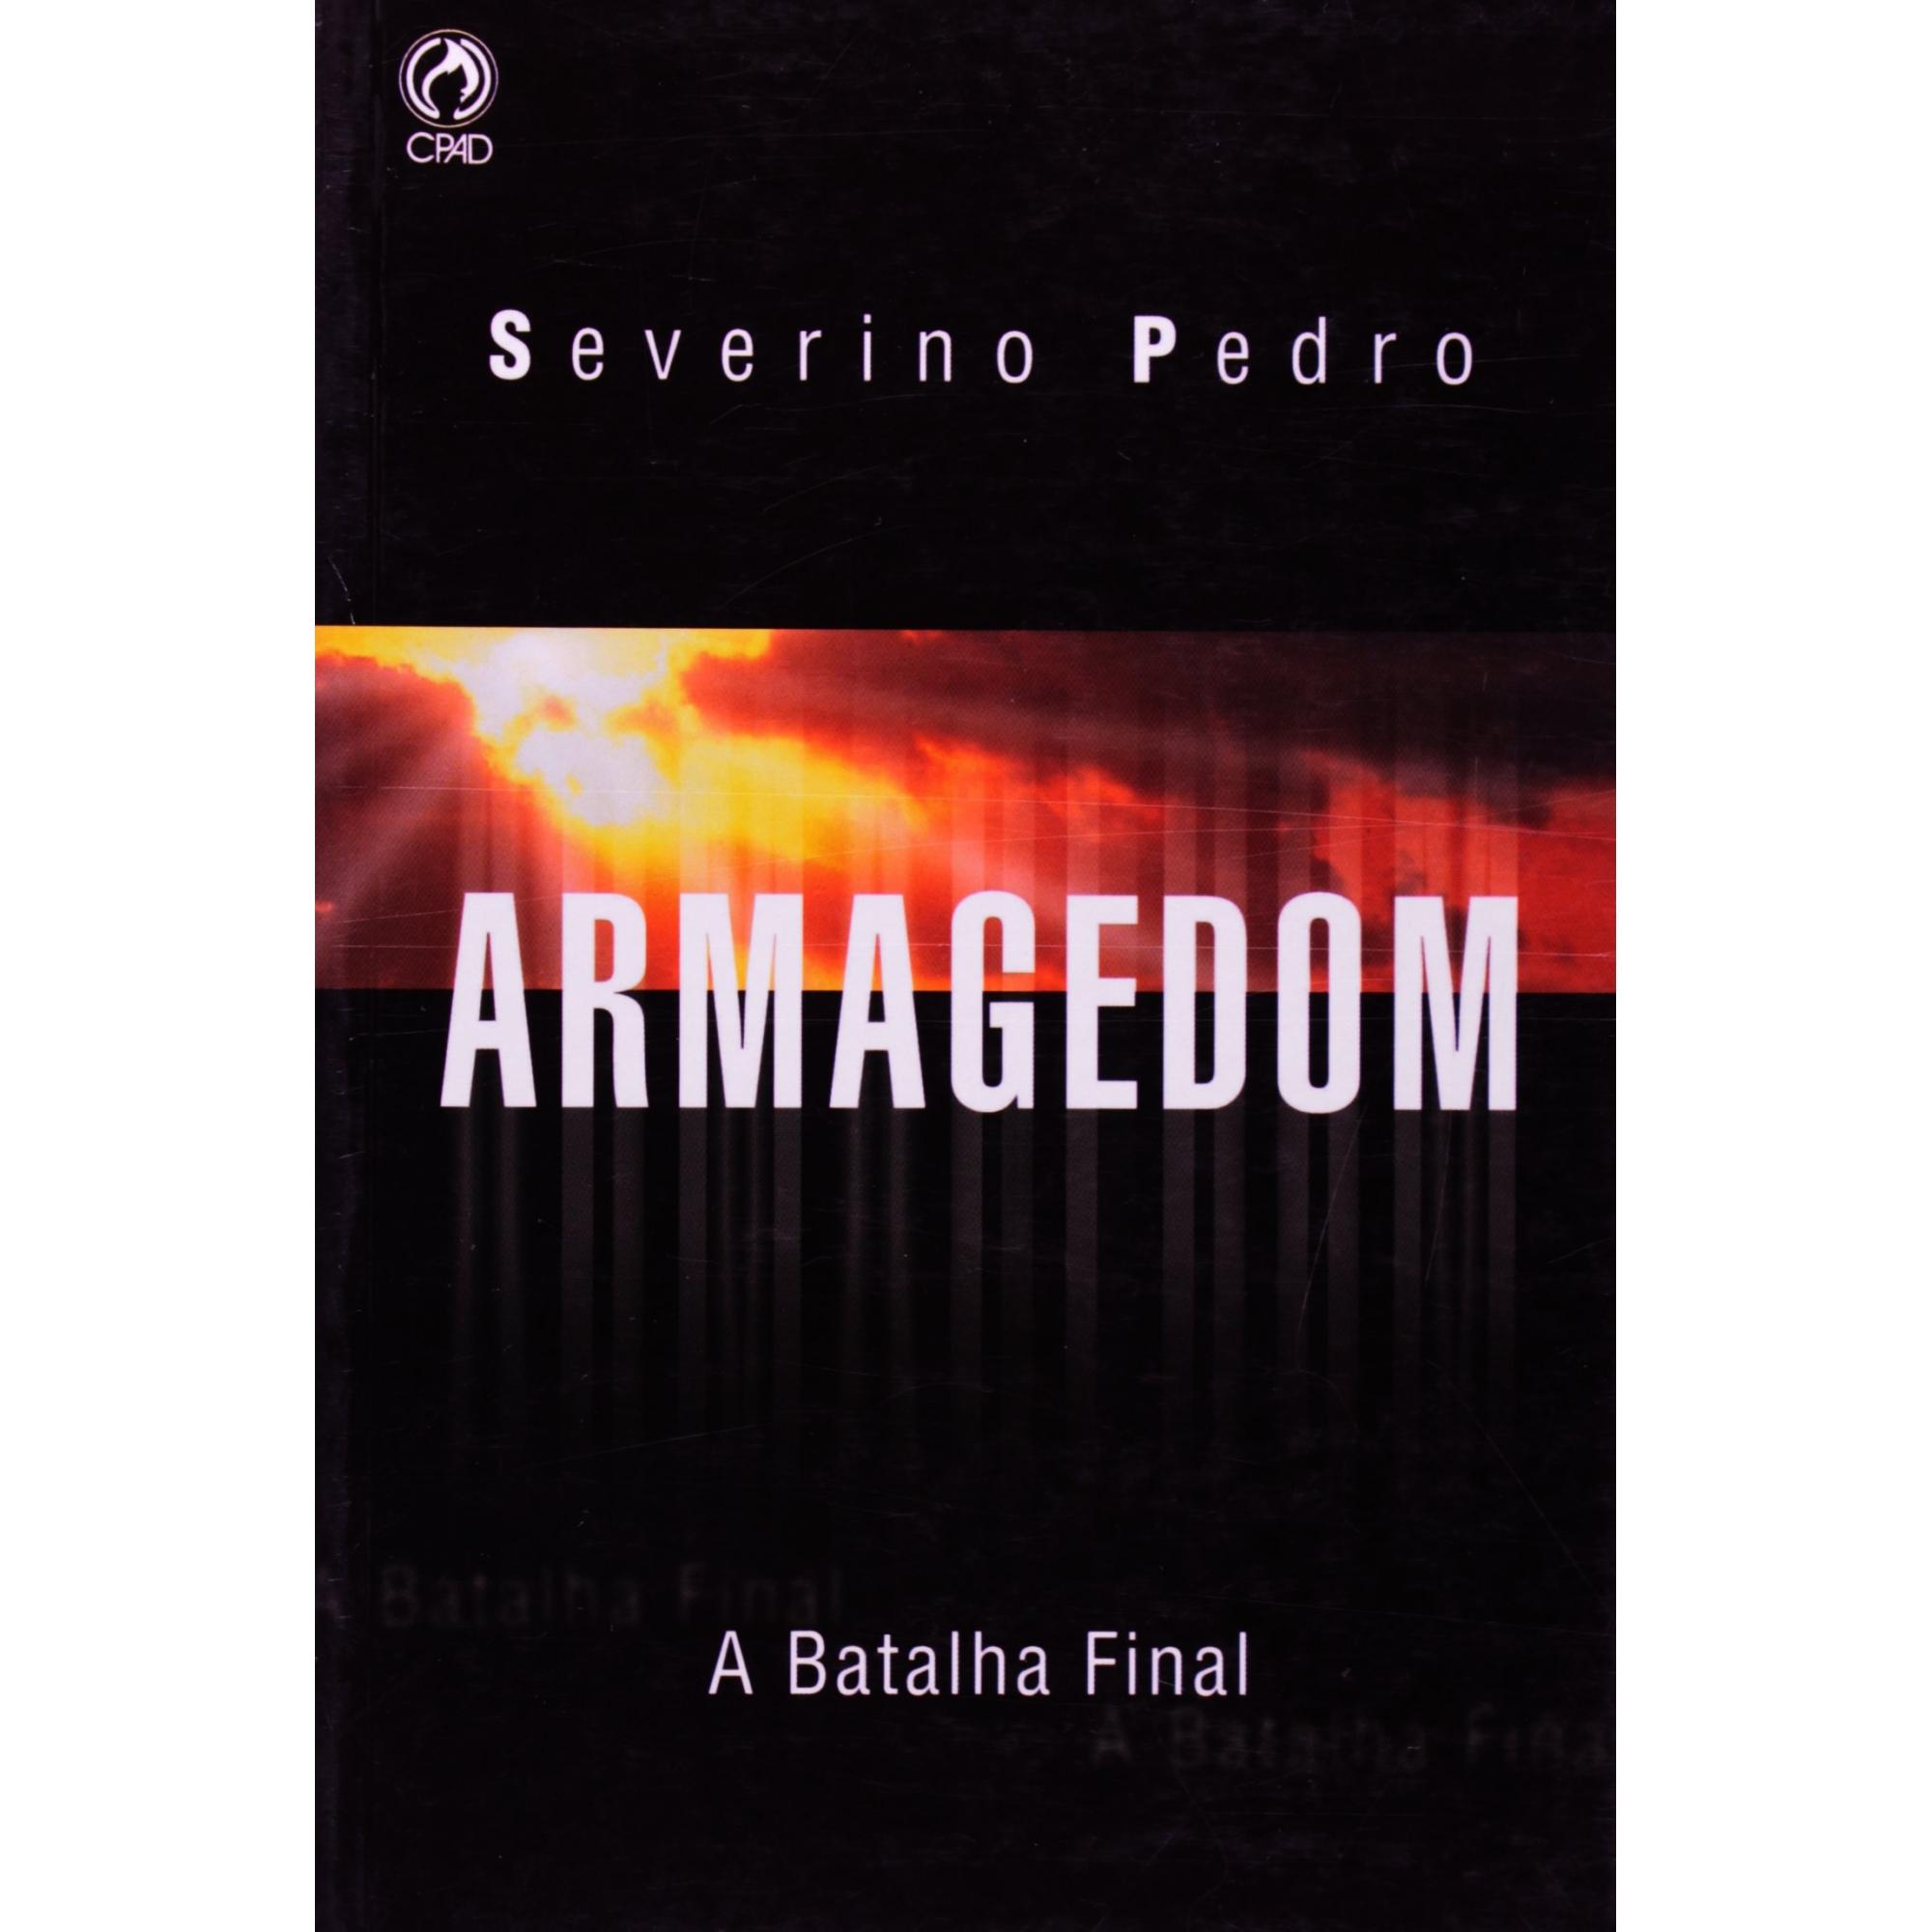 ARMAGEDOM A BATALHA FINAL